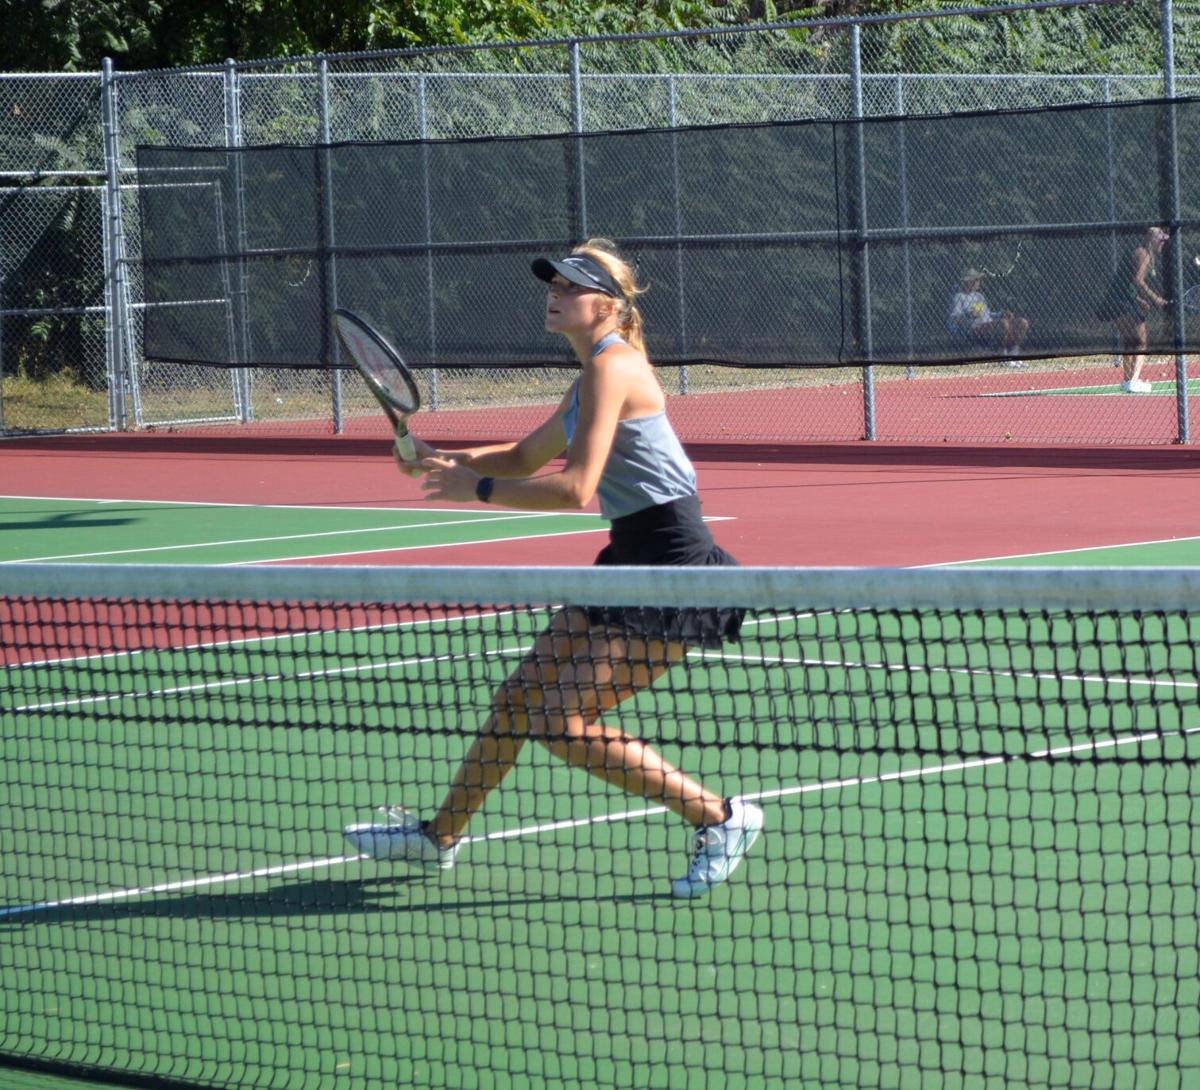 10-11-21-tennis 2